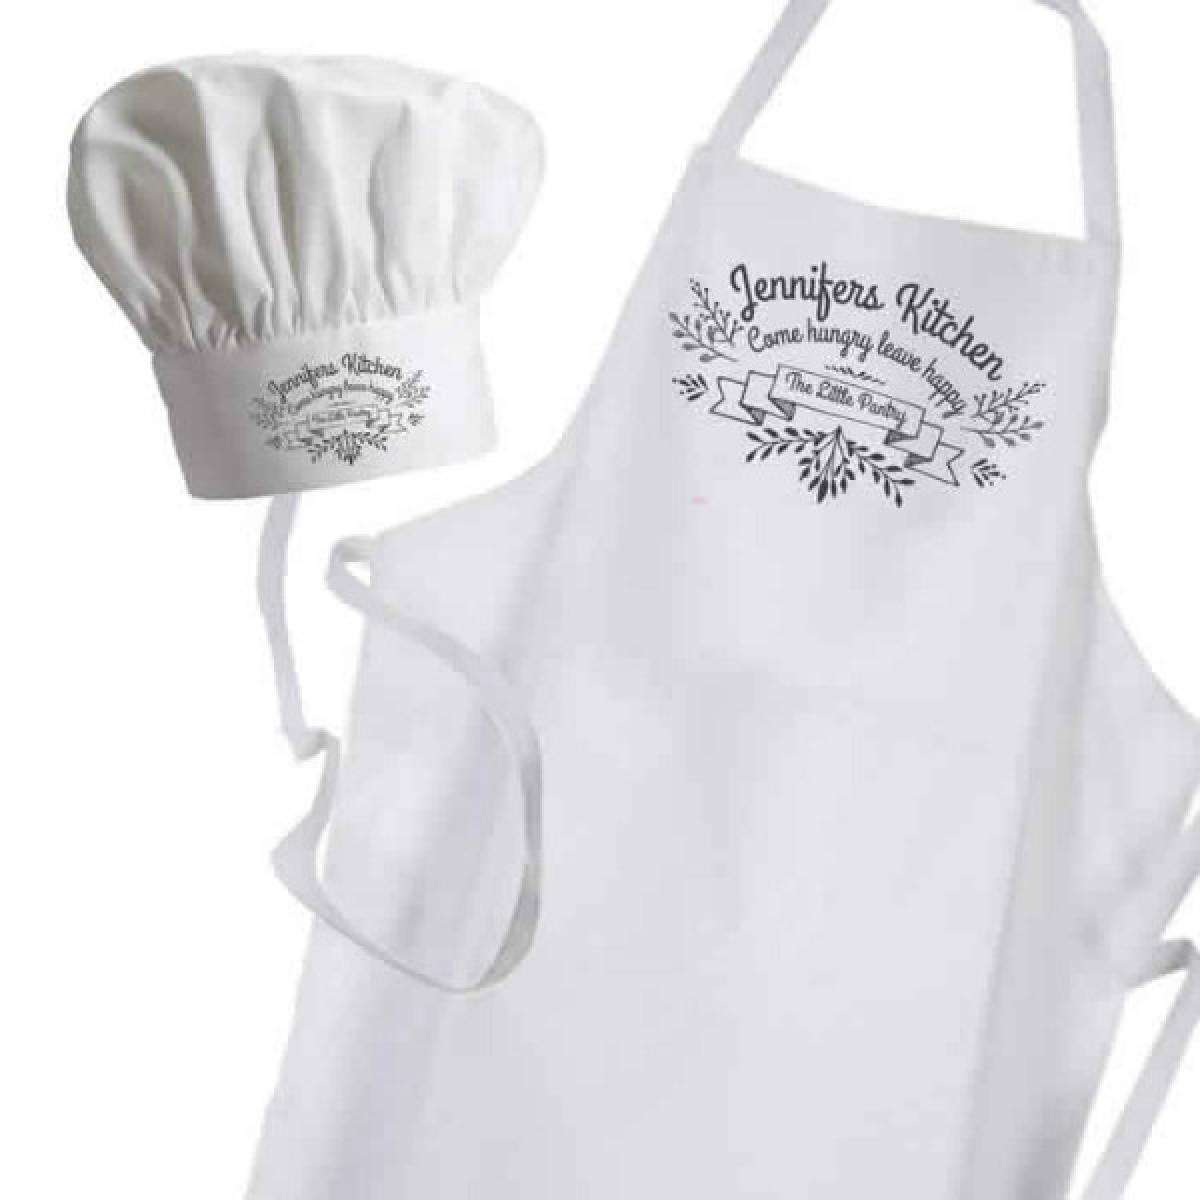 White apron ladies - Ornamental Kitchen Personalised Apron Ladies Fun Chef Kitchen Cooking Dinner Christmas Gift